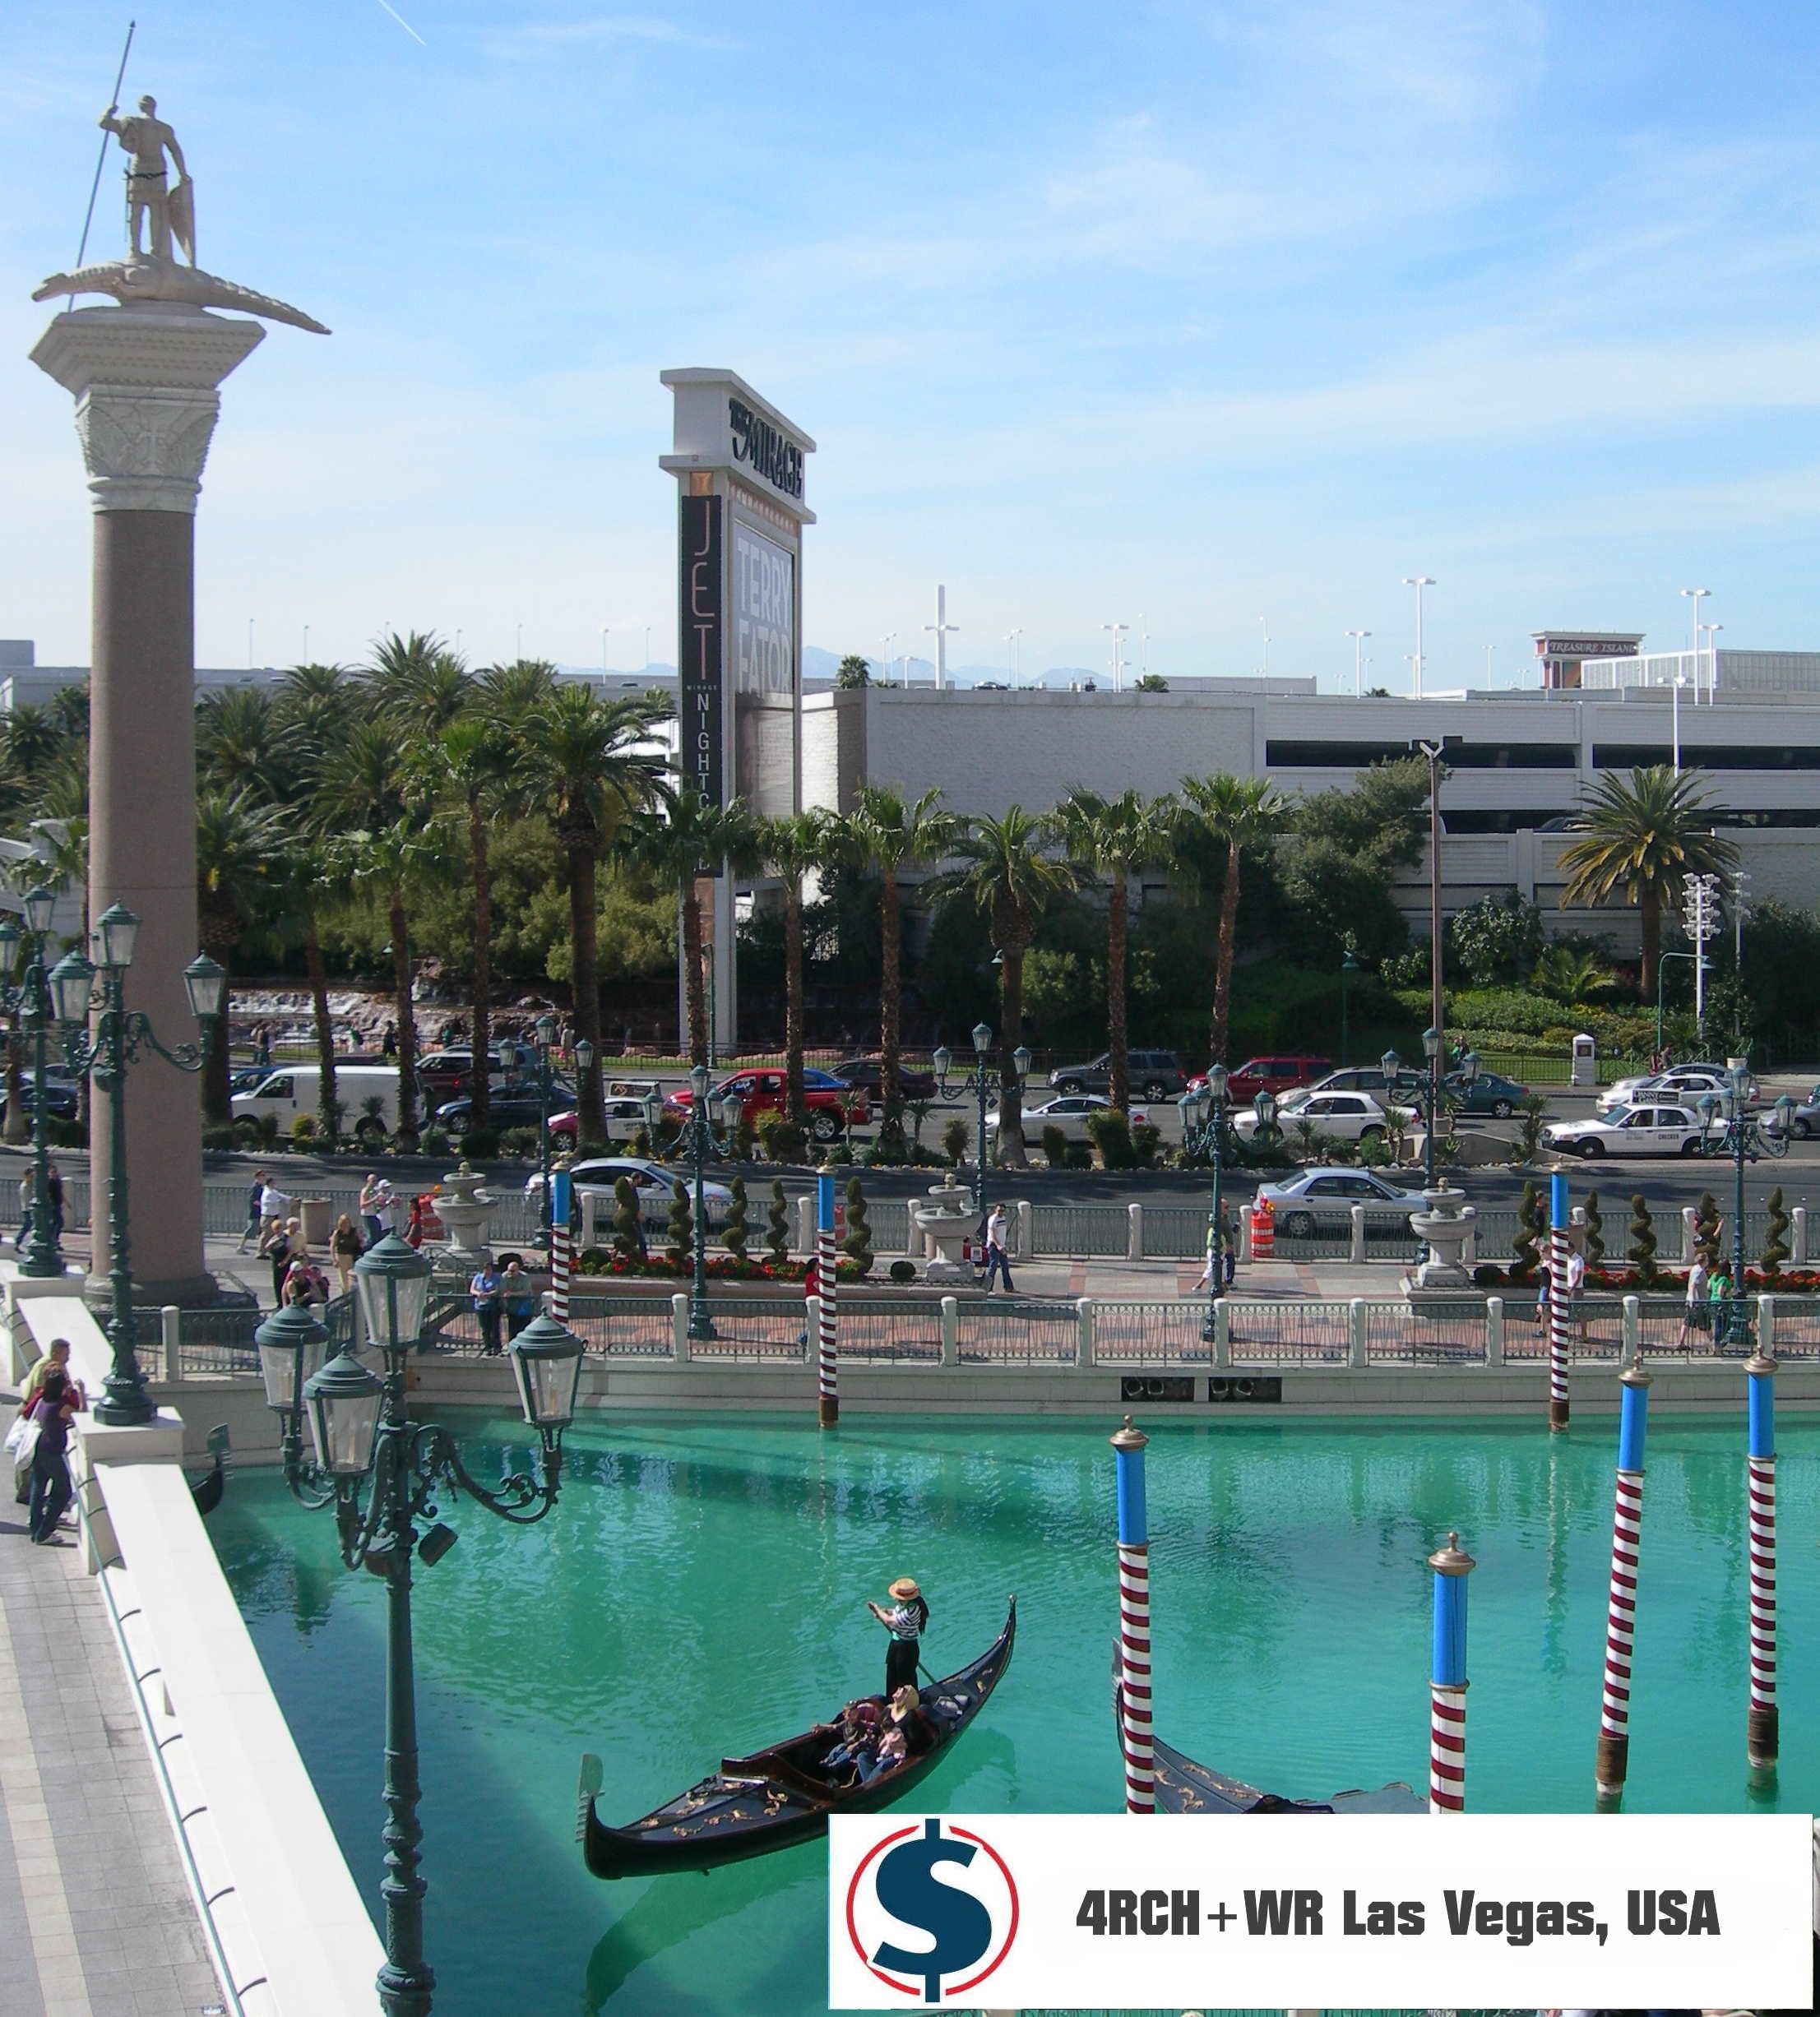 17.03.2009 r. Venetian Hotel Las Vegas